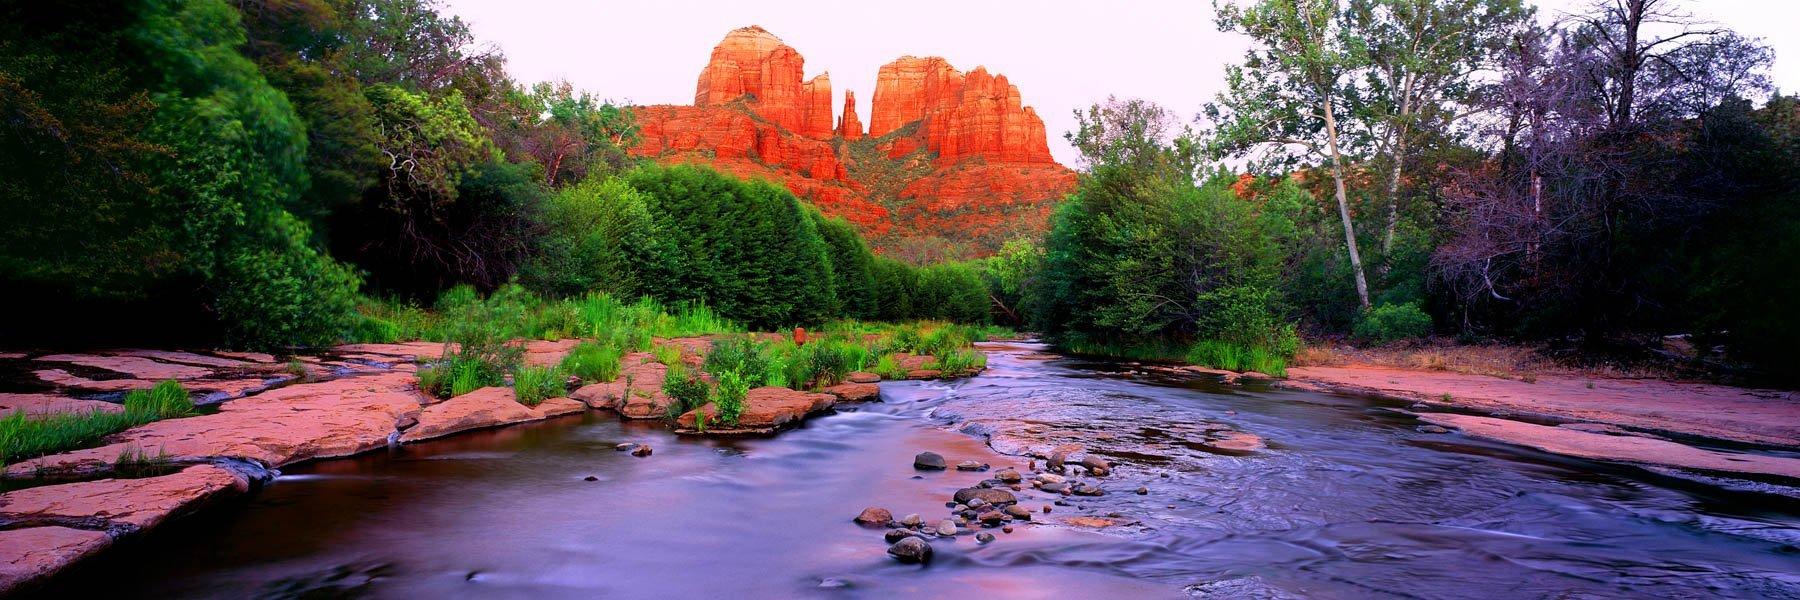 Oak Creek in Sedona, Arizona, USA.